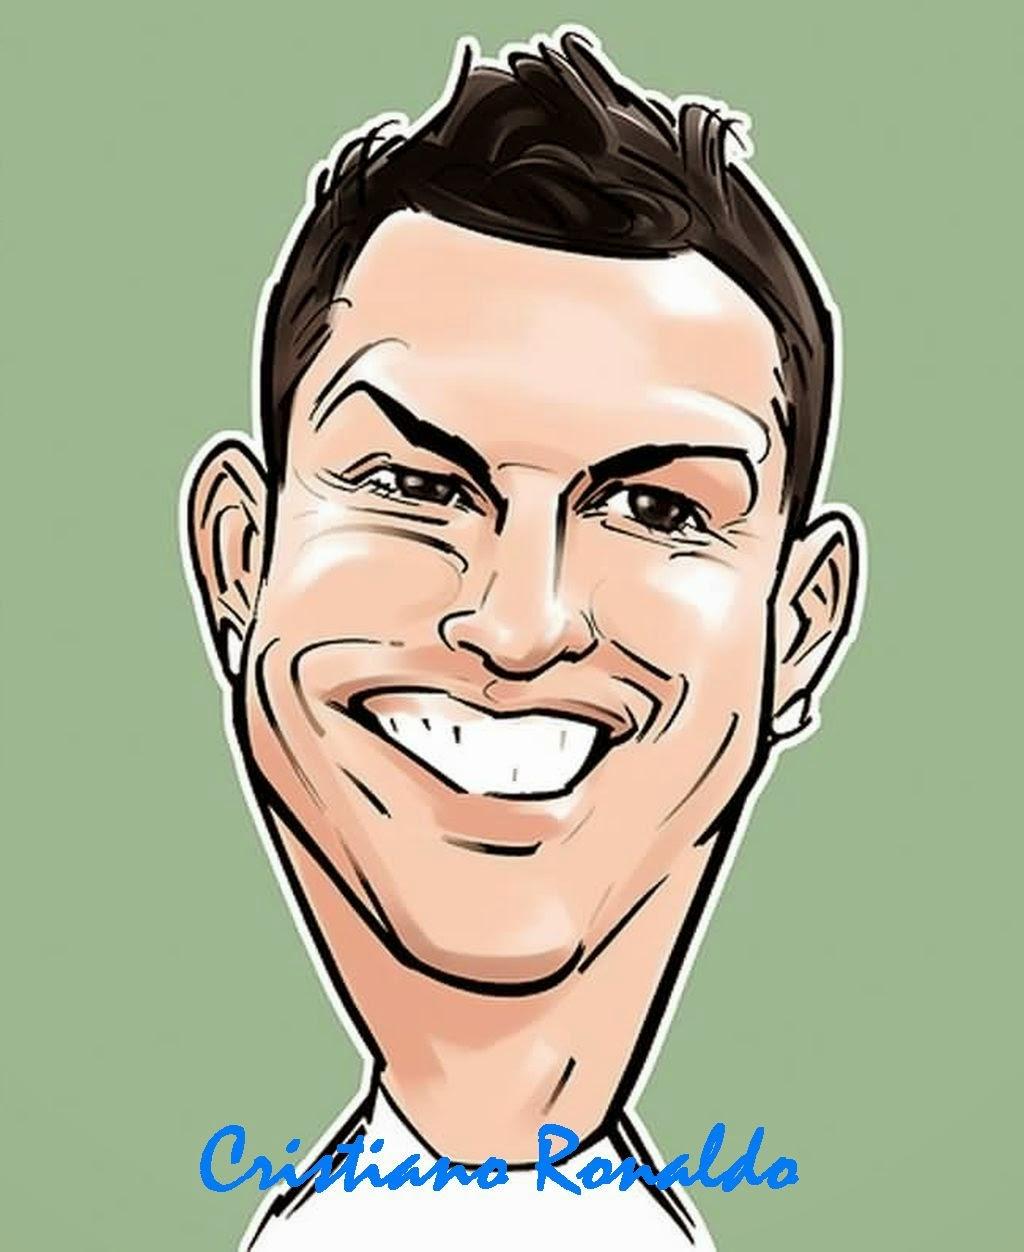 Gambar Lucu Kartun Pemain Bola